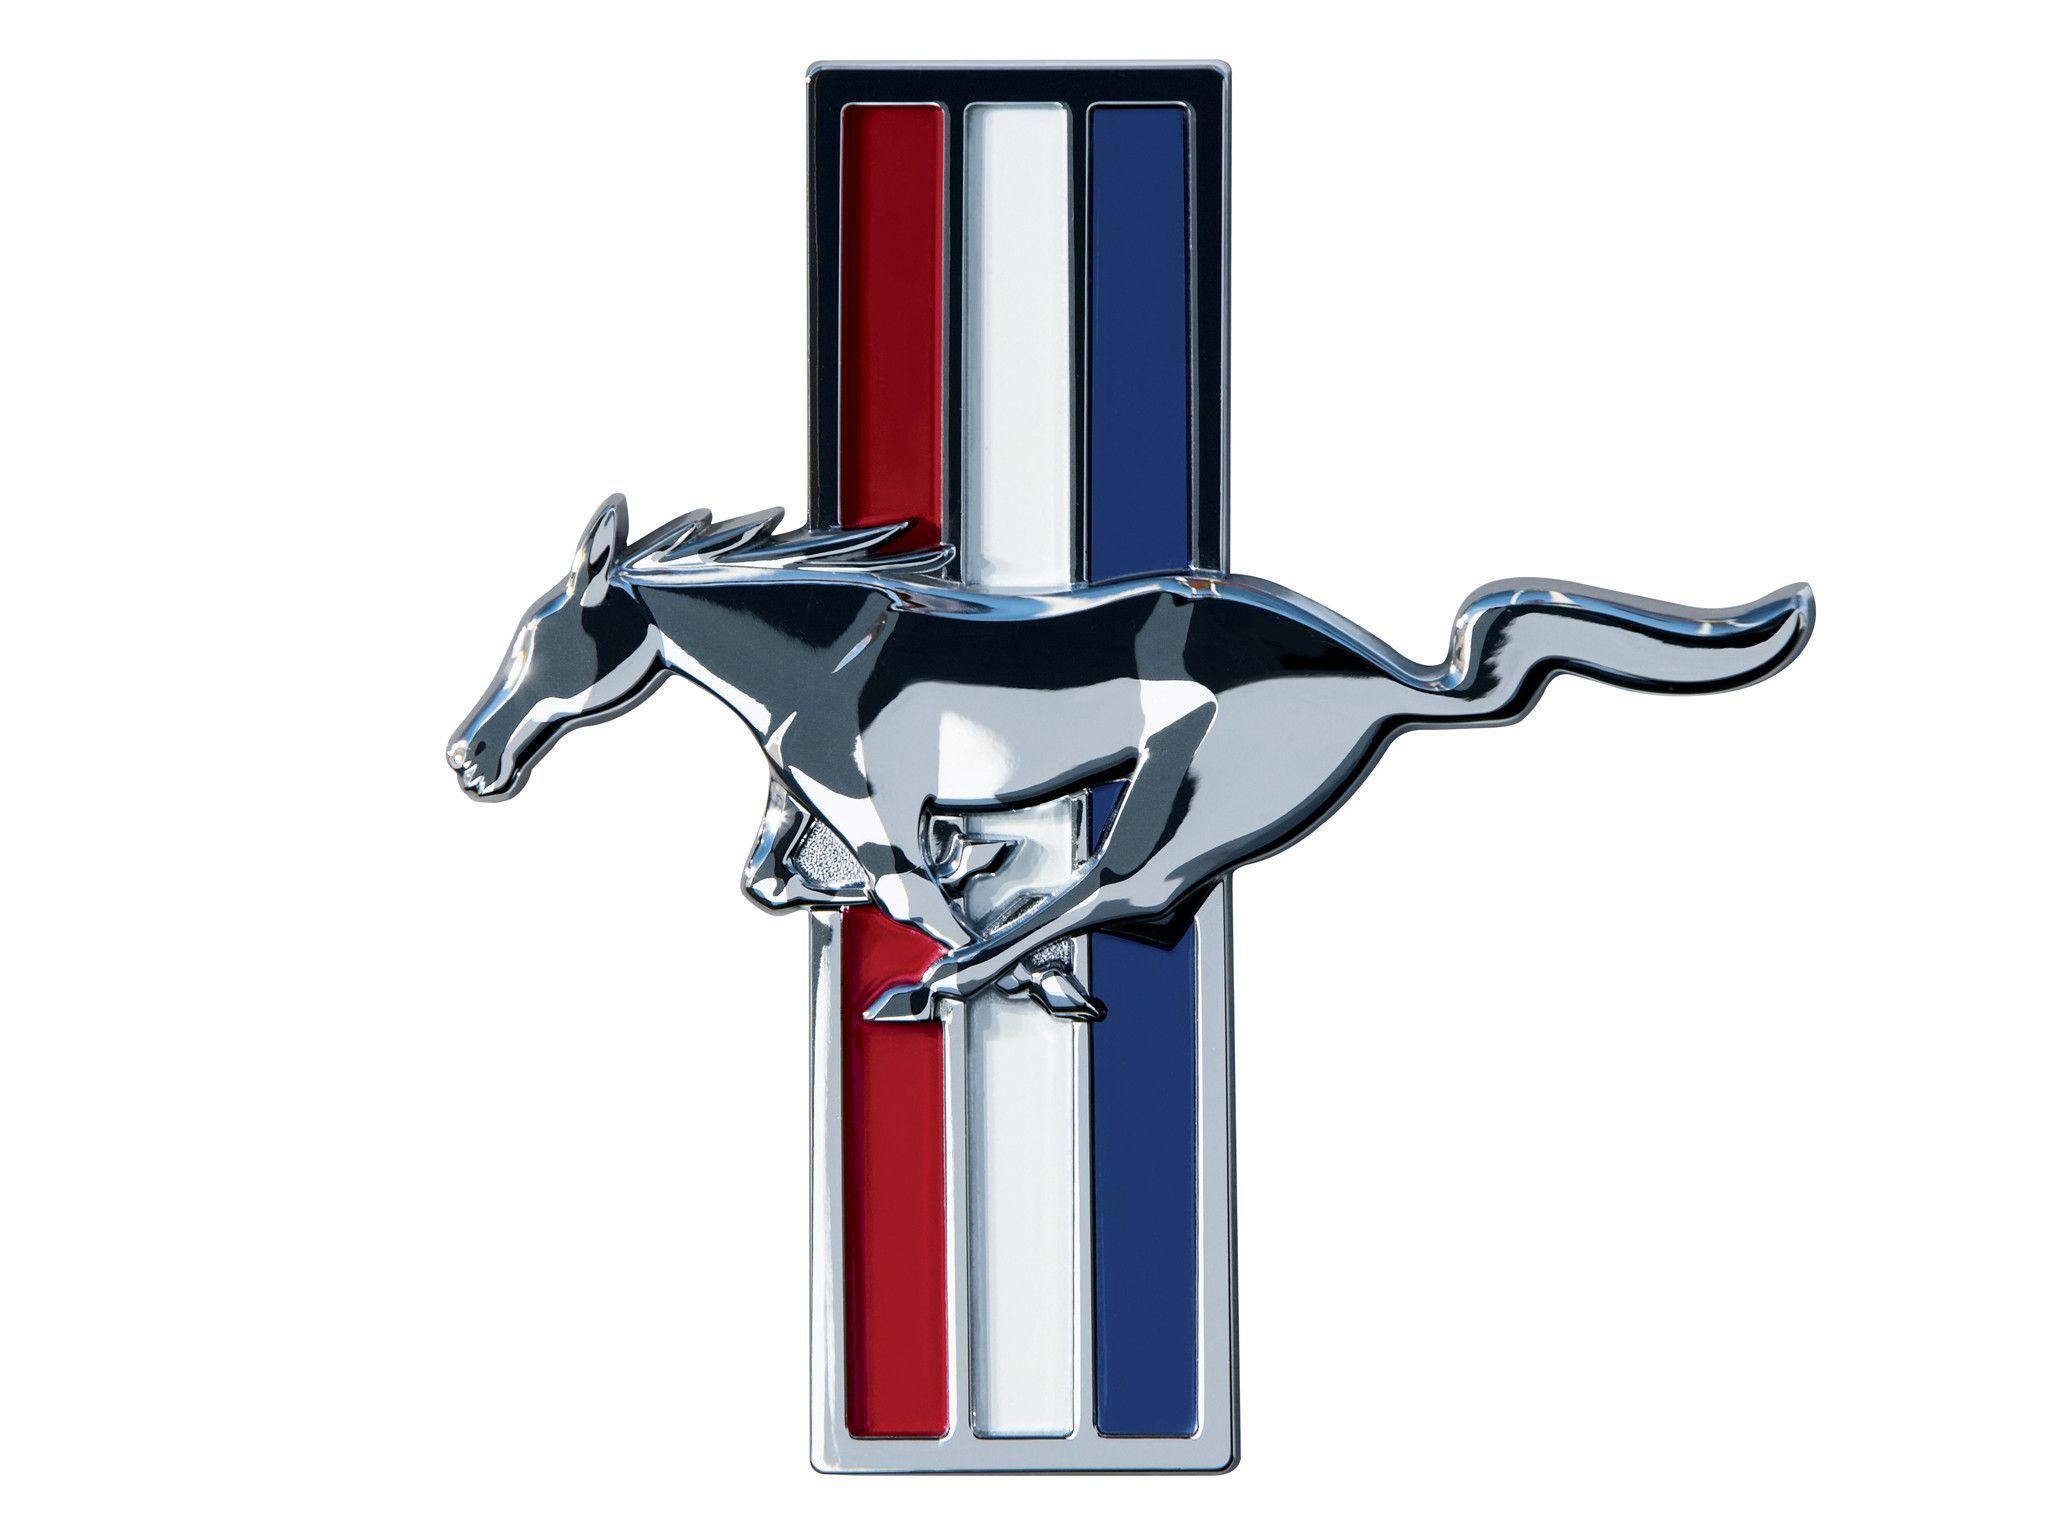 ford mustang logo background wallpaper basic background - Ford Mustang Logo Images